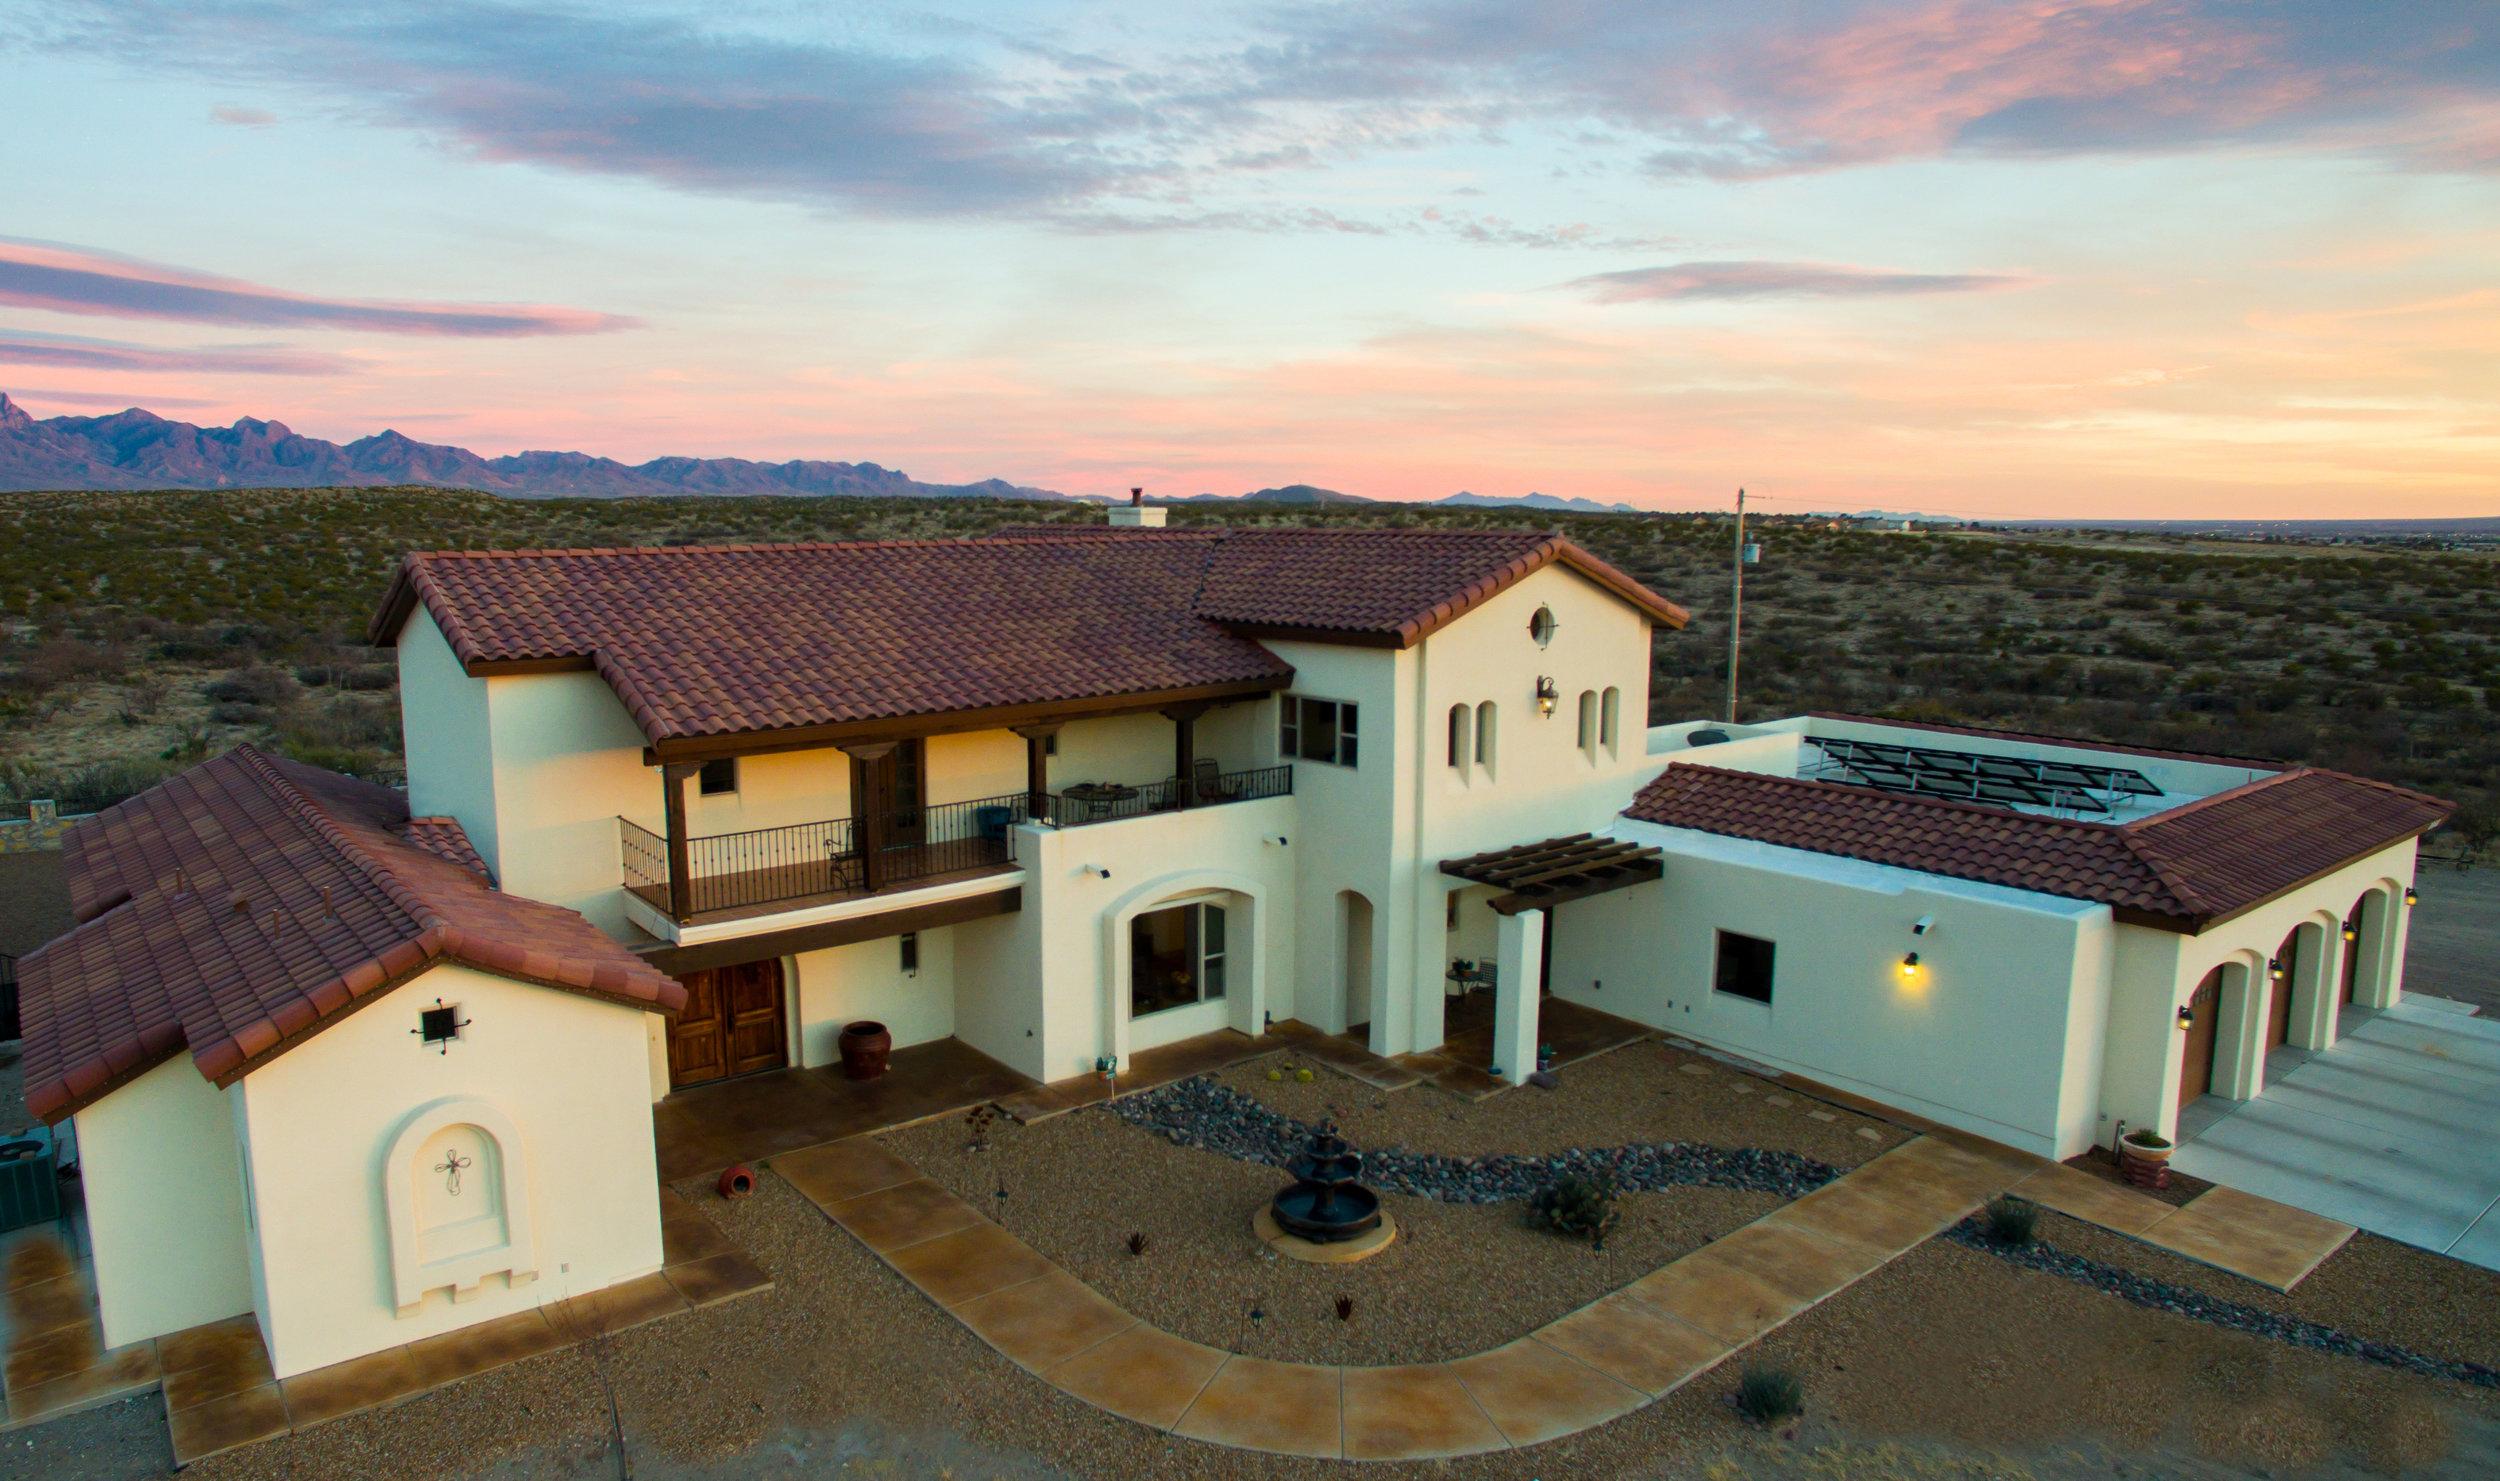 Residence near Dona Ana, NM